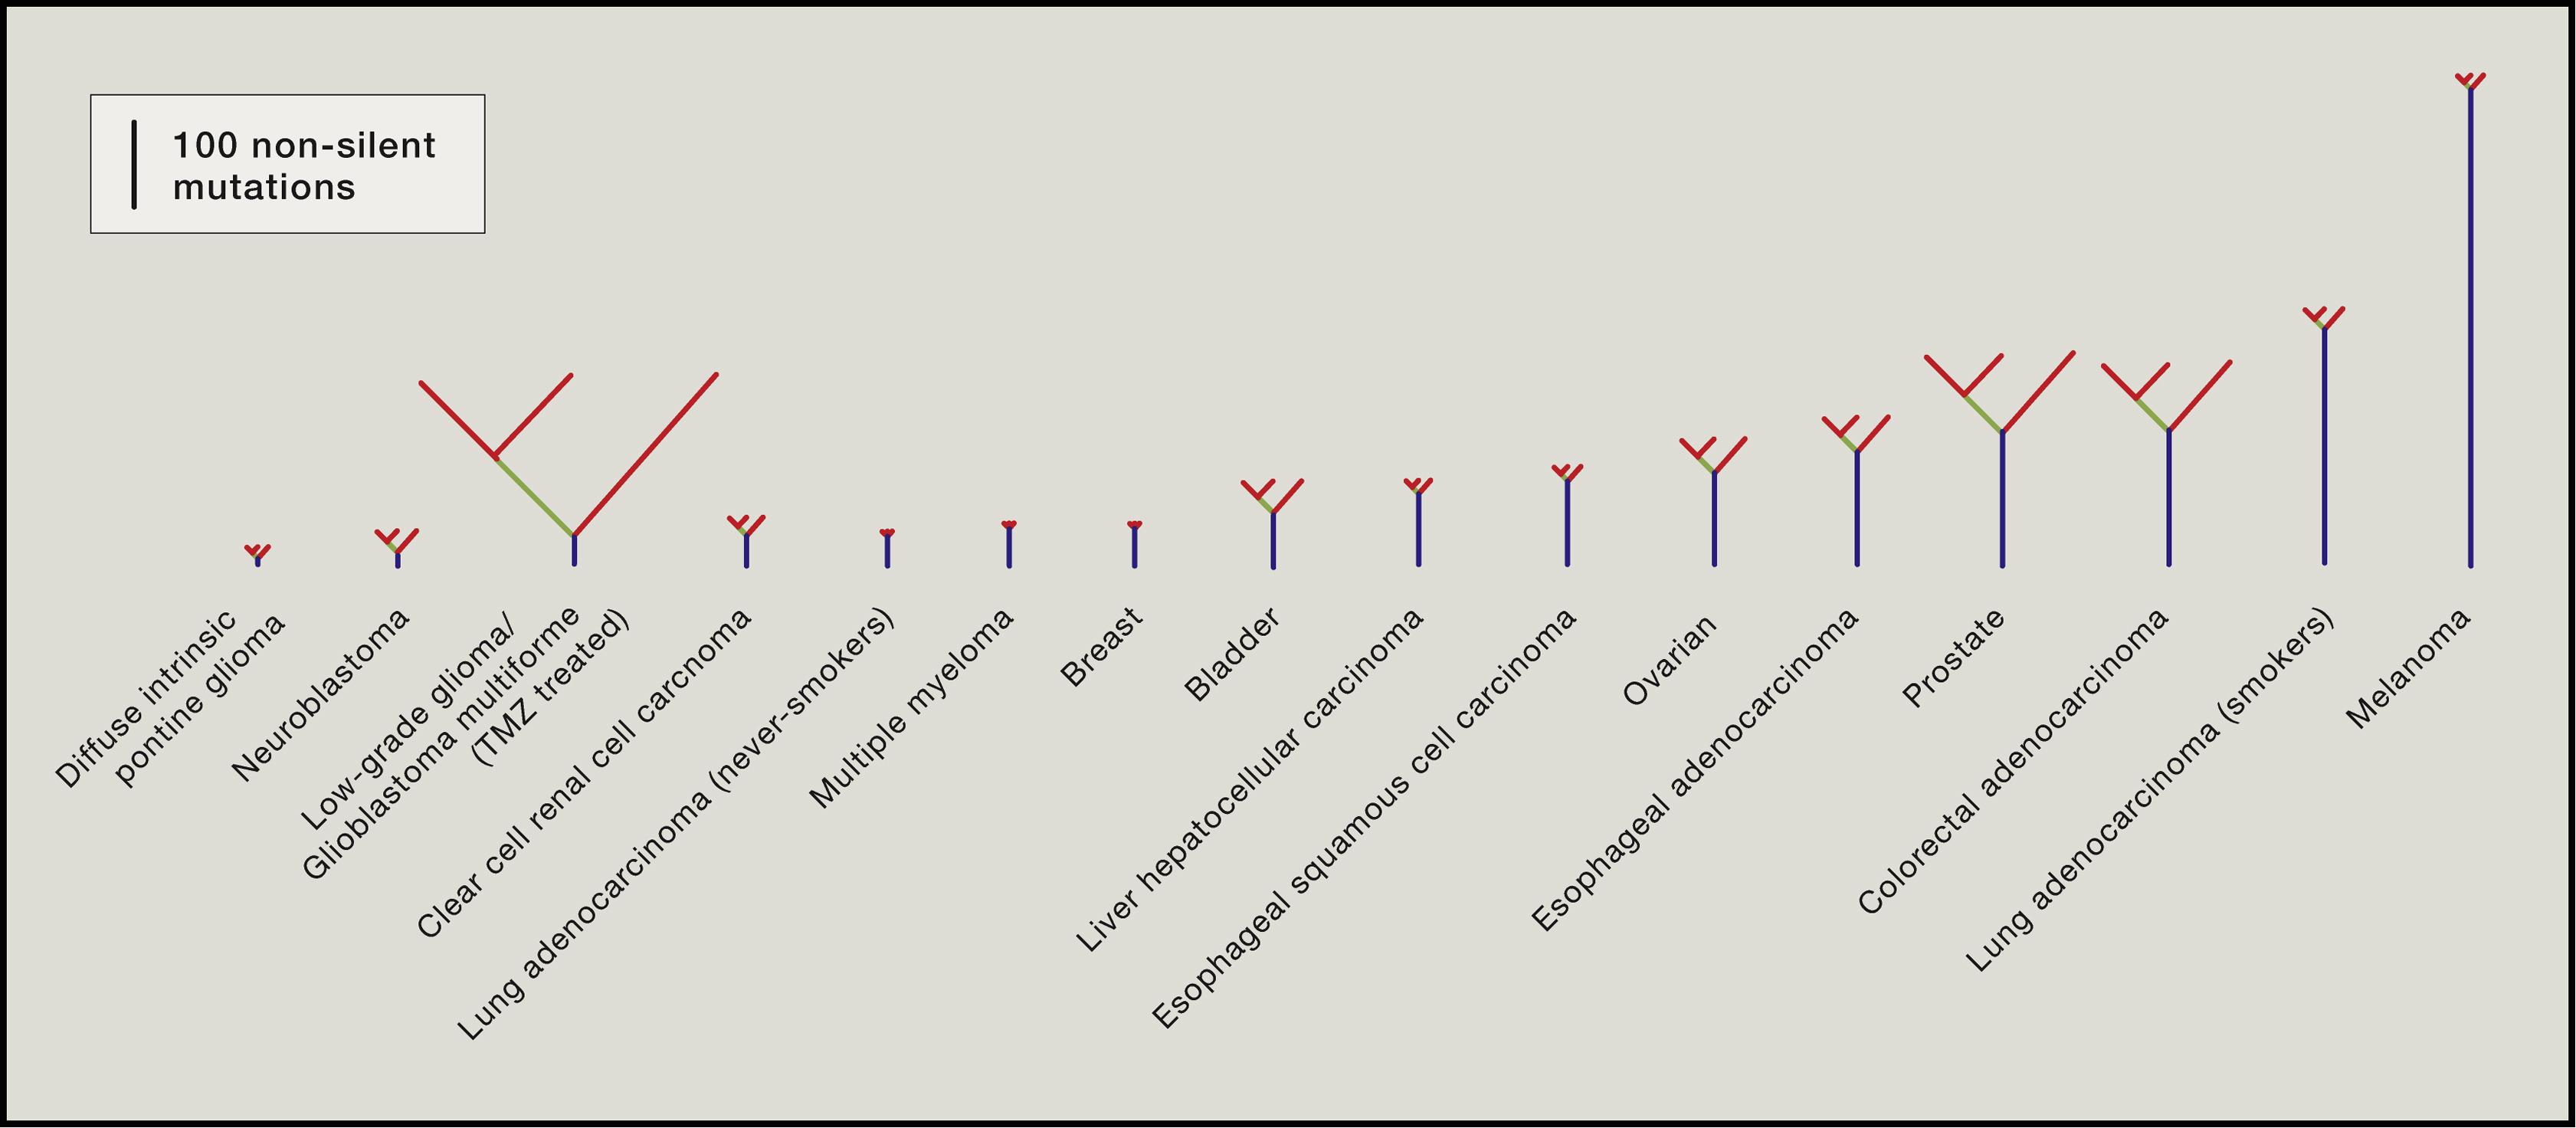 Clonal Heterogeneity and Tumor Evolution: Past, Present